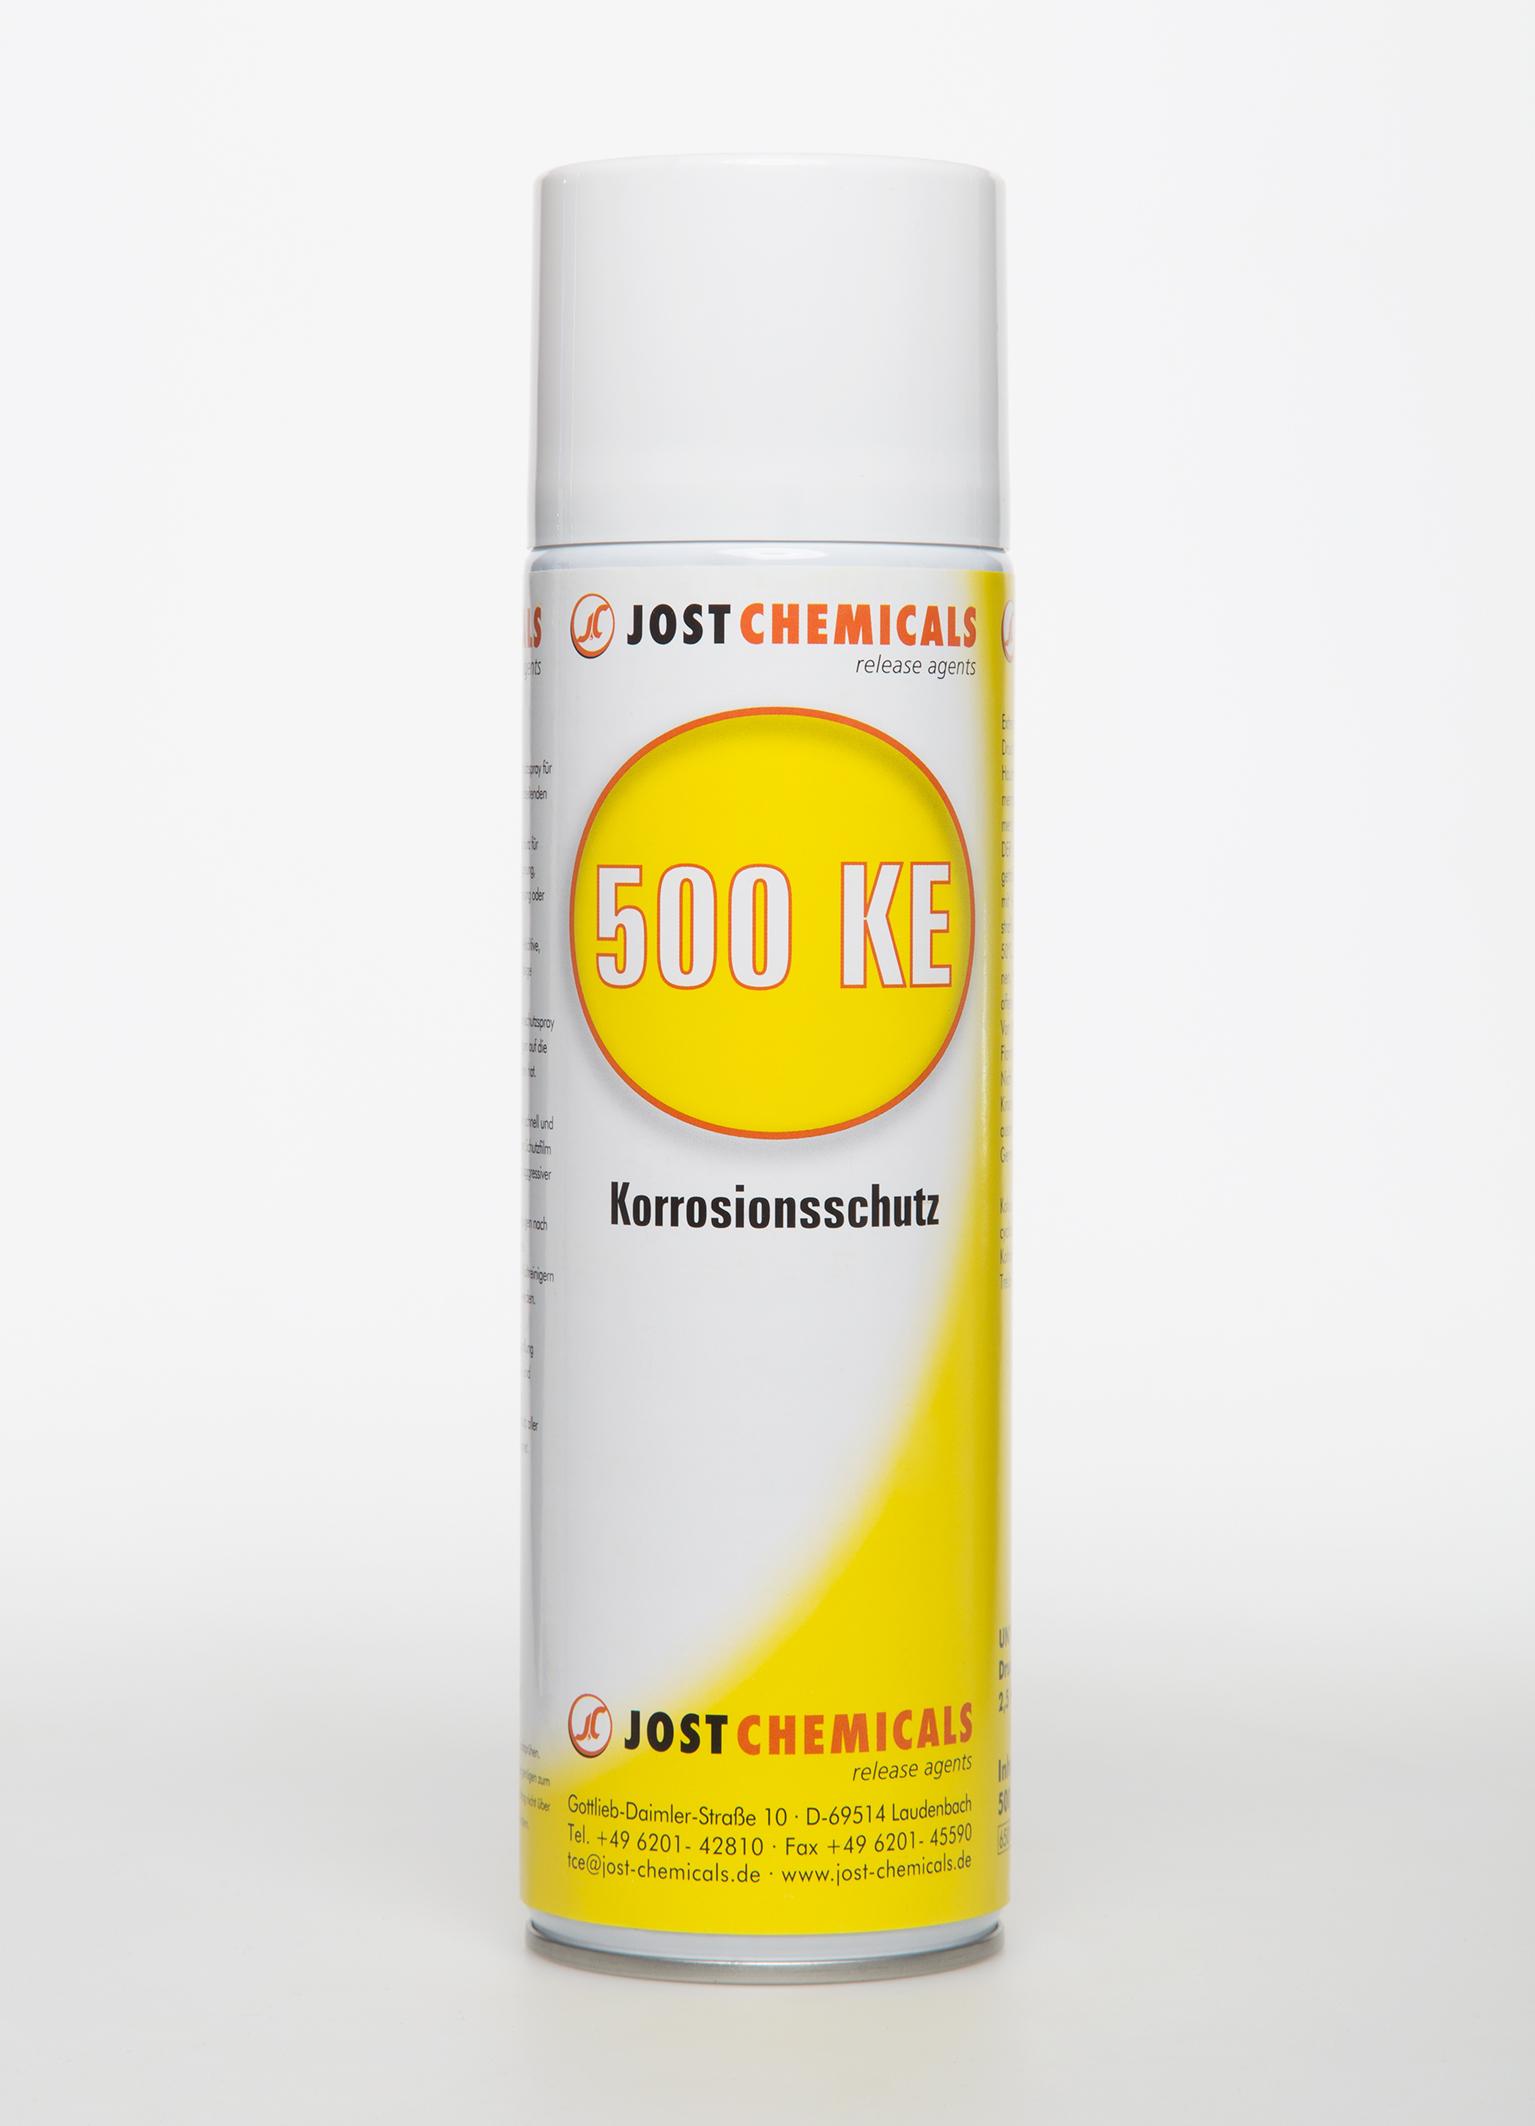 500 KE - Korrosionsschutz